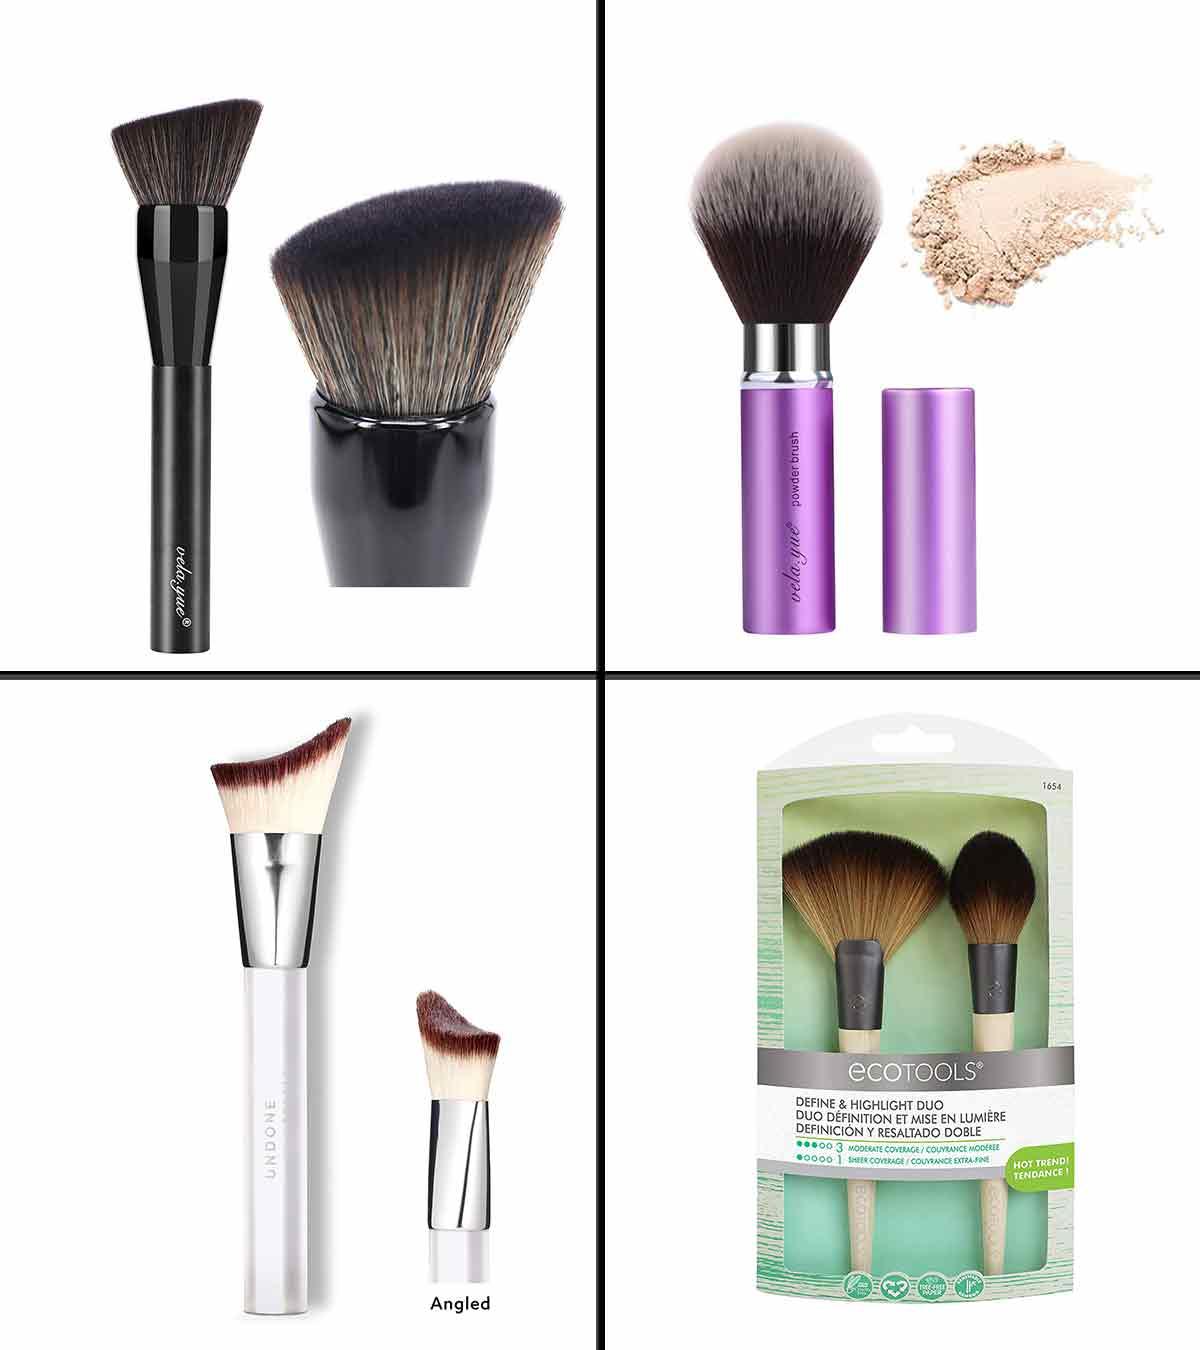 15 Best Drugstore Makeup Brushes Of 2021